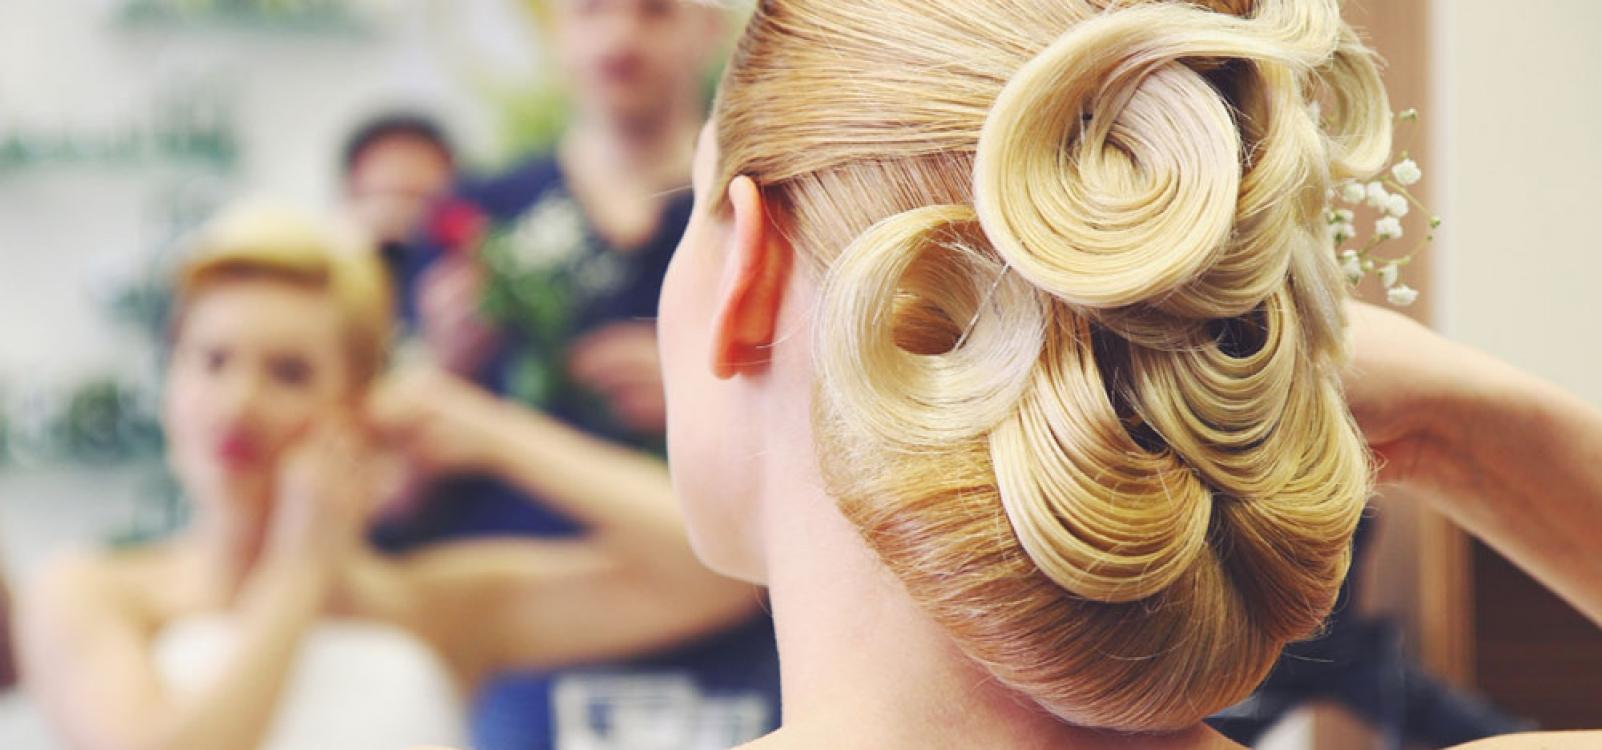 Luxury Bride - Blonde bride with luxury hairstyle